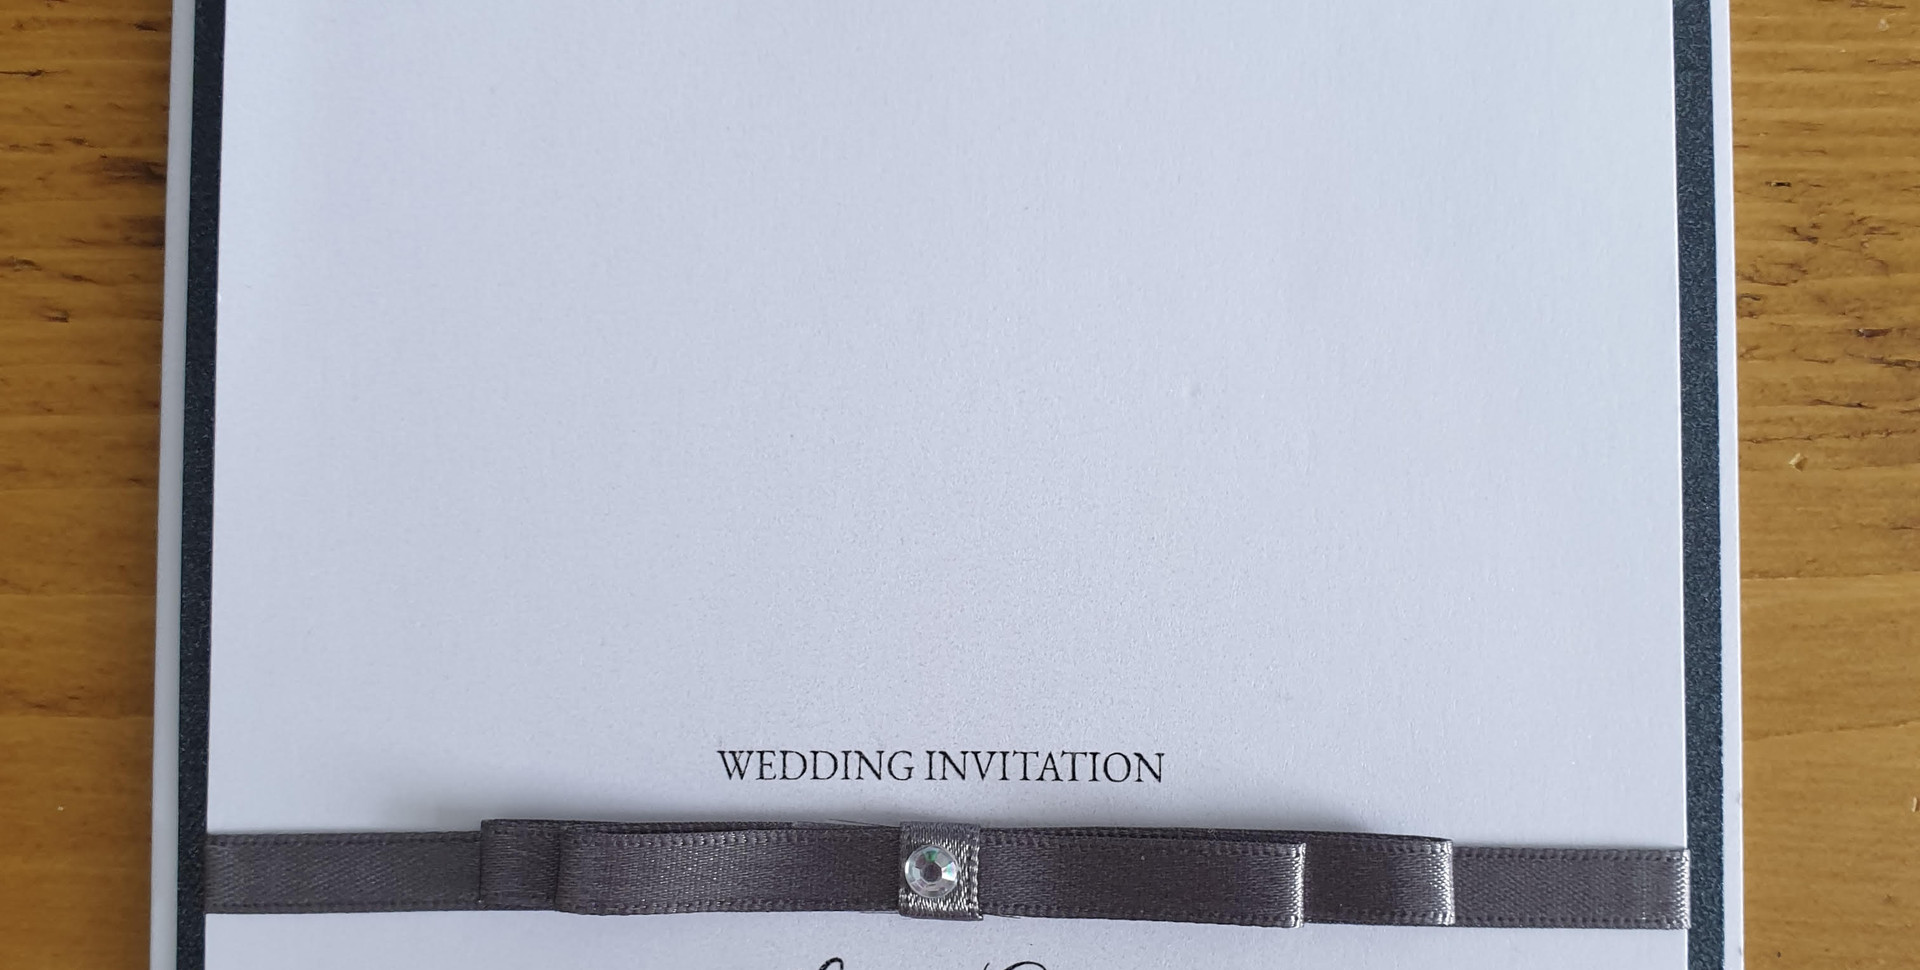 Lori - Day wedding invitation